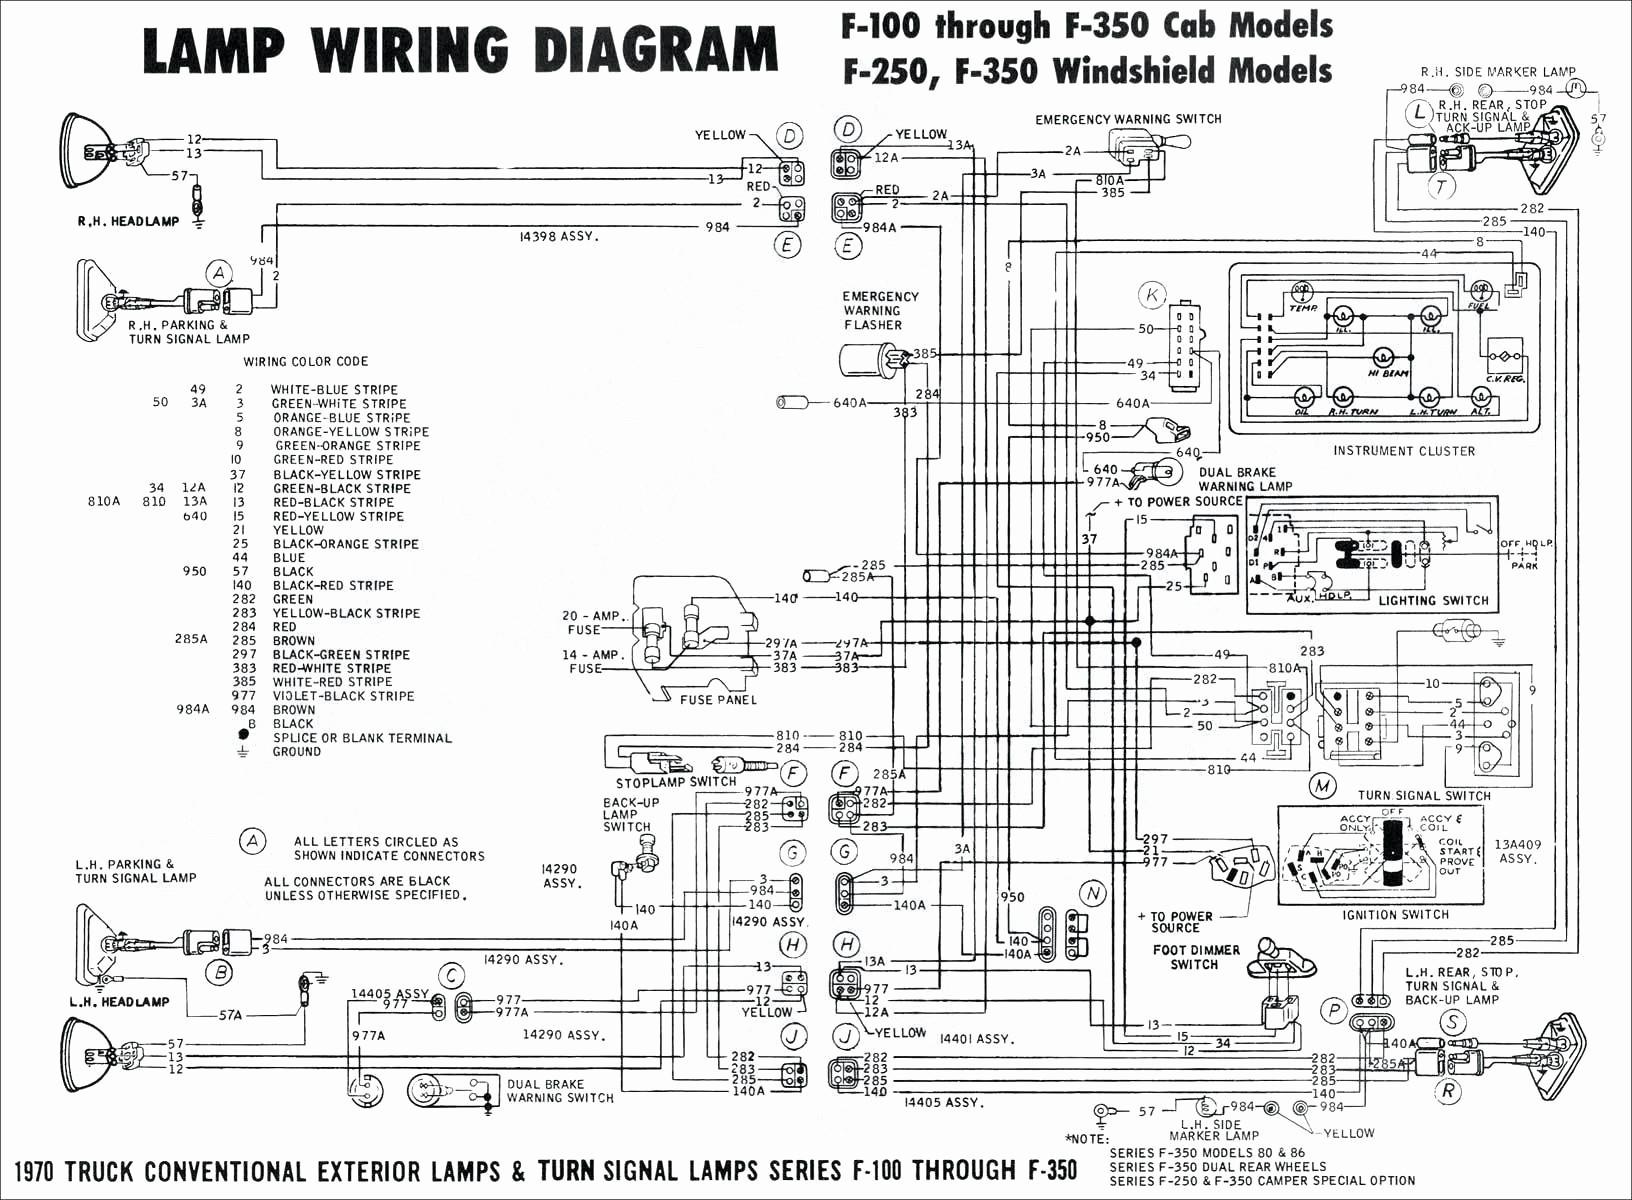 69 Camaro Wiring Diagram 1969 Camaro Wiring Diagram